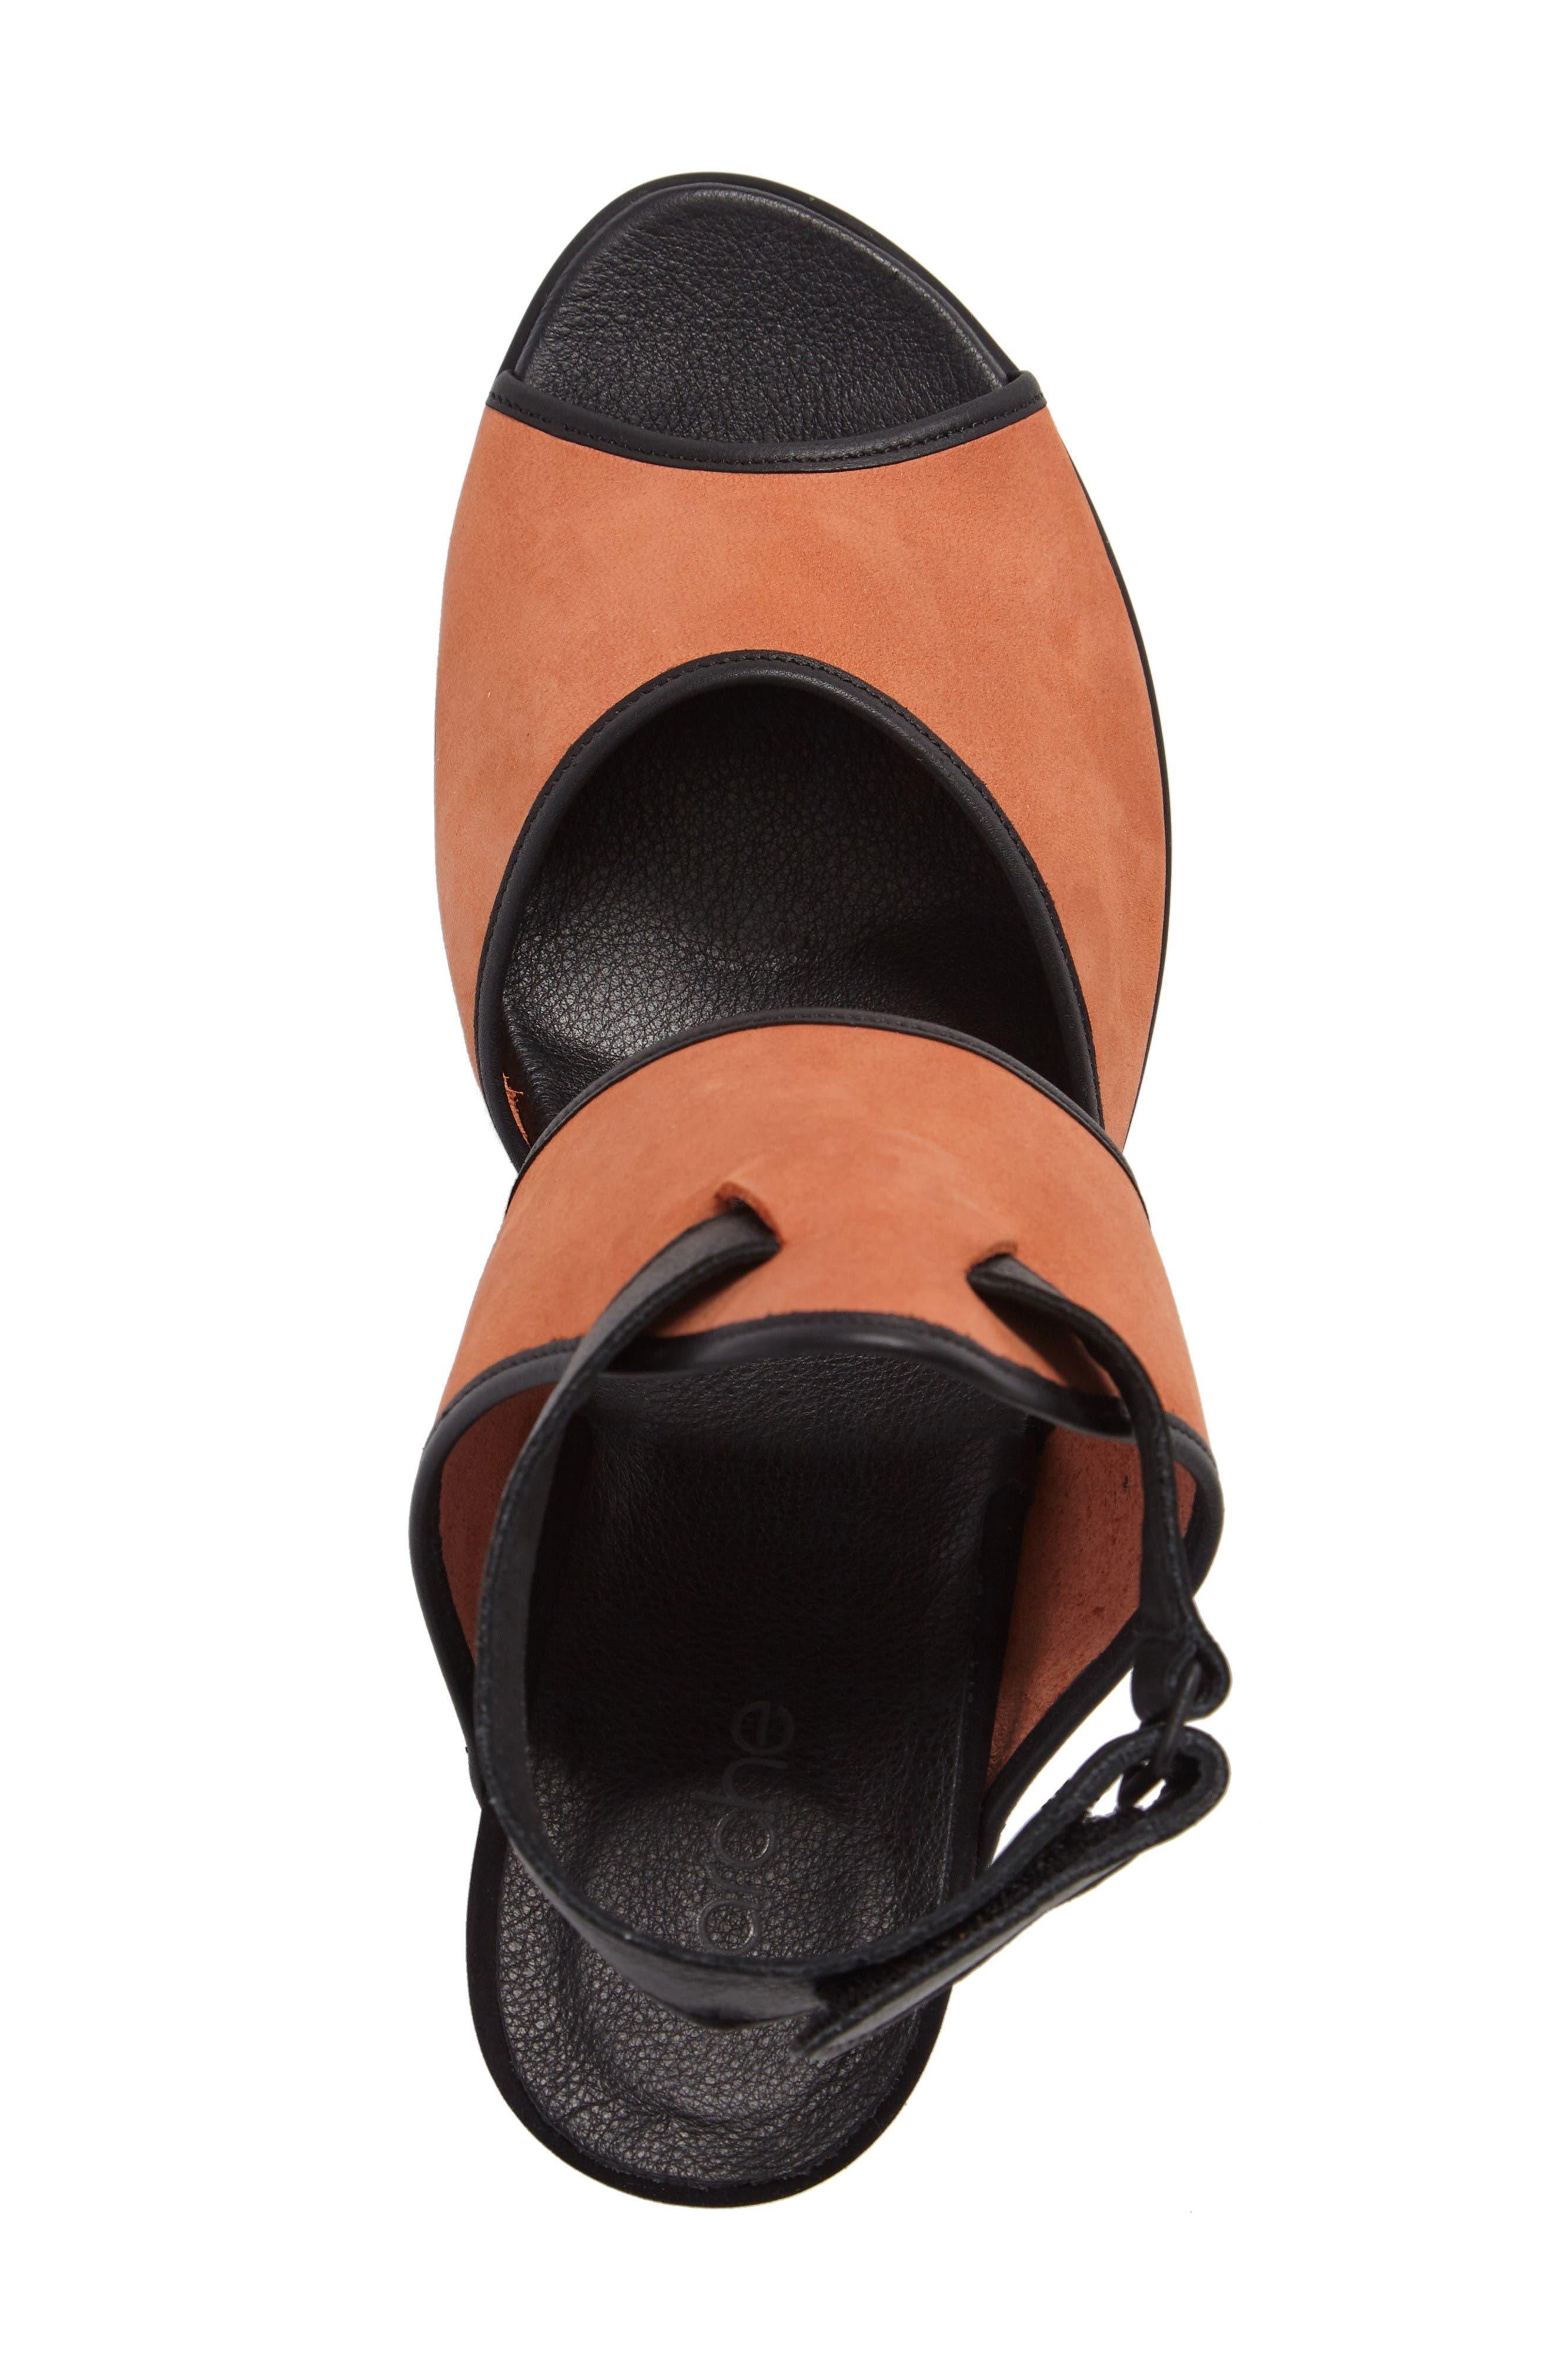 Leiga Sandal,                             Alternate thumbnail 5, color,                             Morgane Nubuck Leather